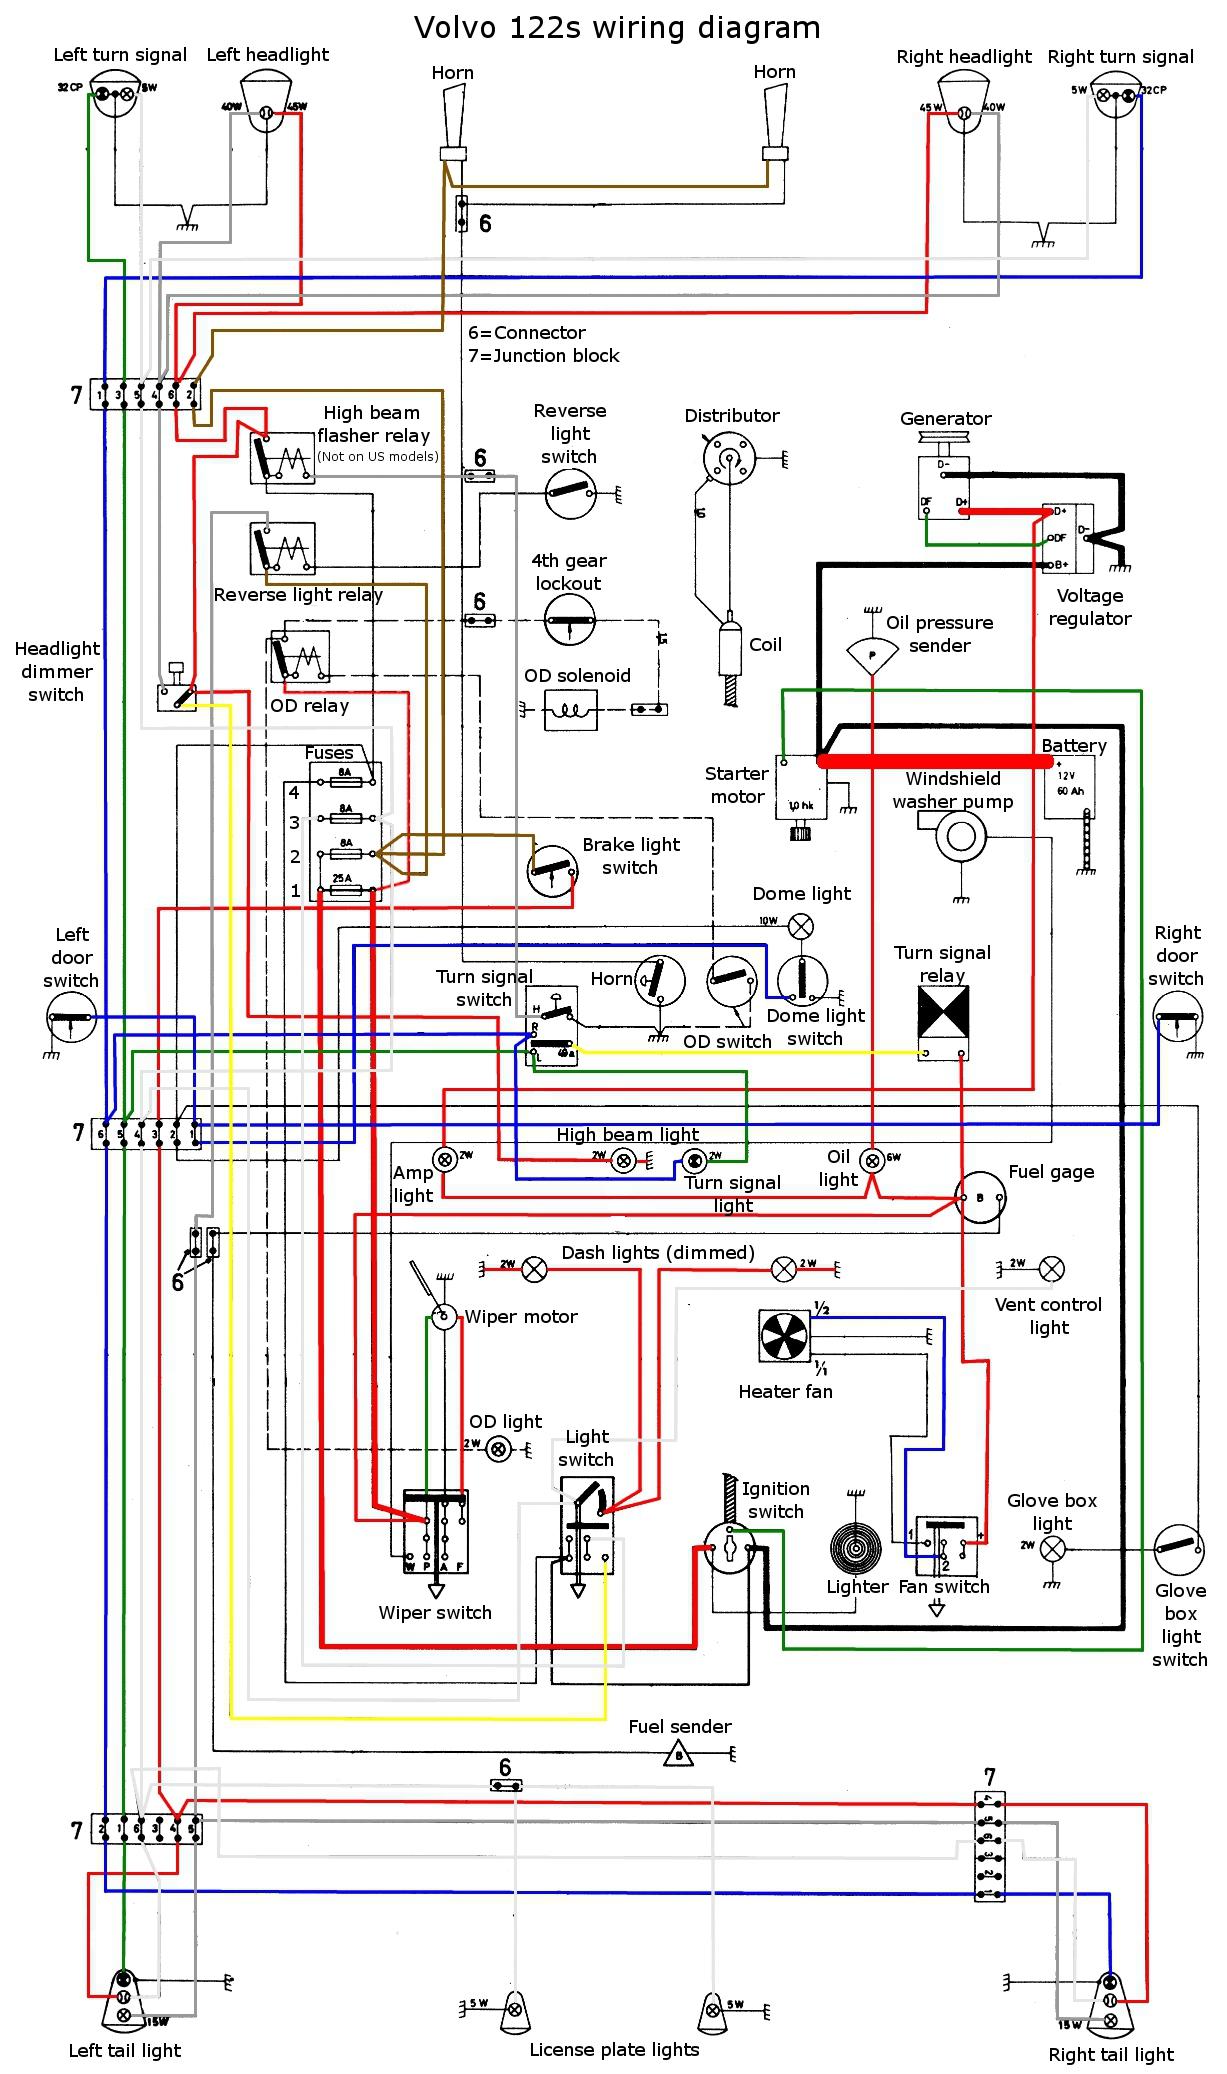 Wiring Diagram Volvo S60 2001 - Astra Envoy Fuse Box - schematics -source.karo-wong-liyo.jeanjaures37.fr | Volvo S60 Window Wiring Diagram |  | Wiring Diagram Resource